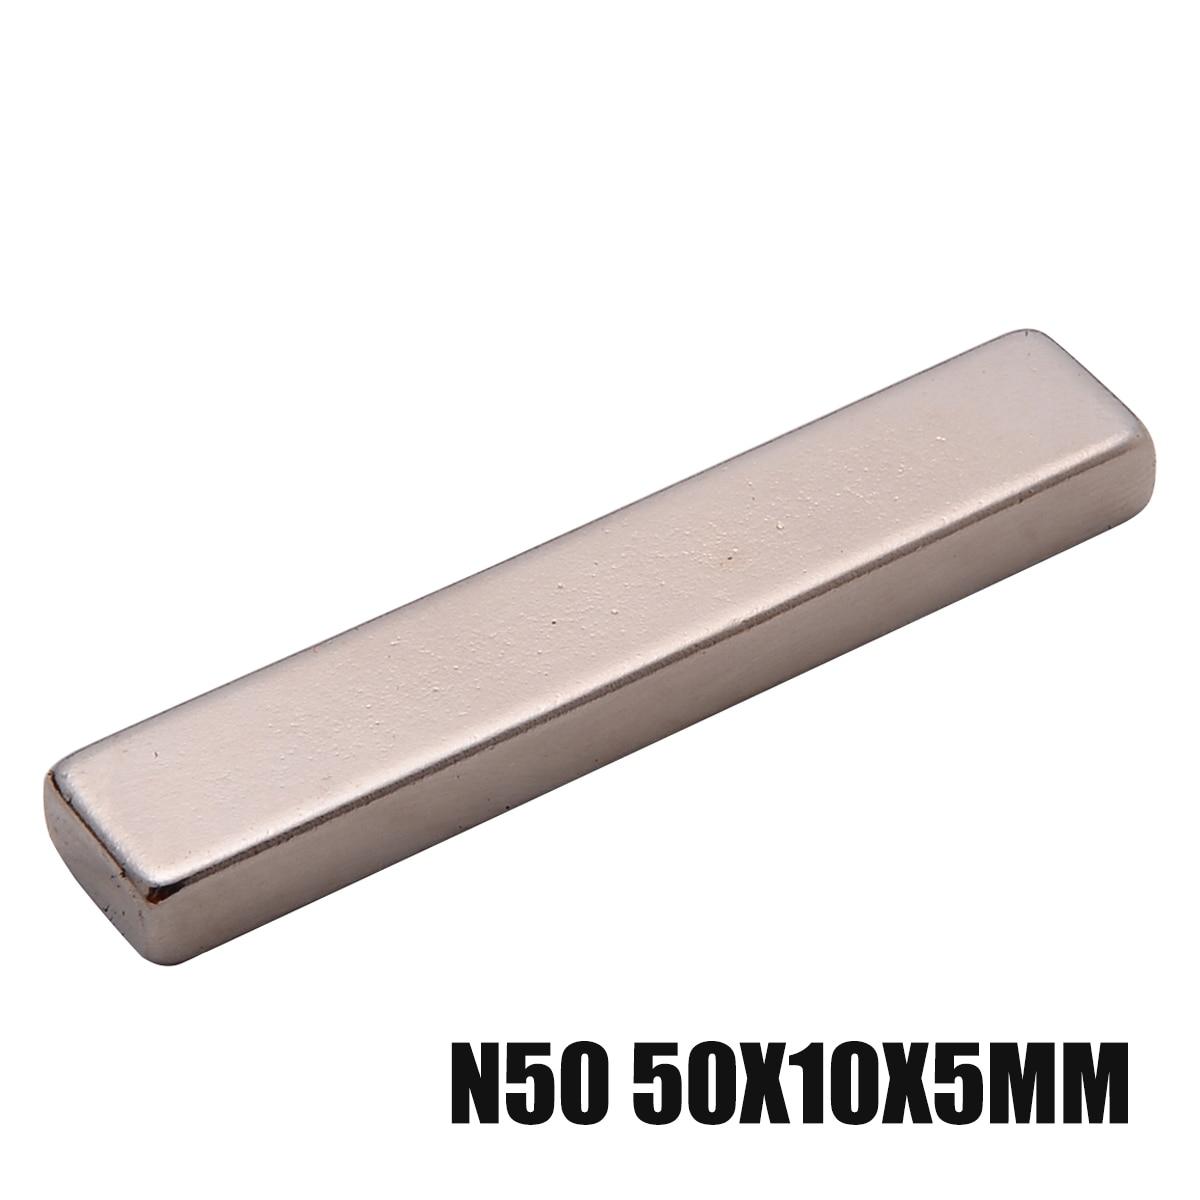 DIY 50x10x5mm Super Strong Rare Earth Neodymium Long Bar Block Motor Magnet Kit